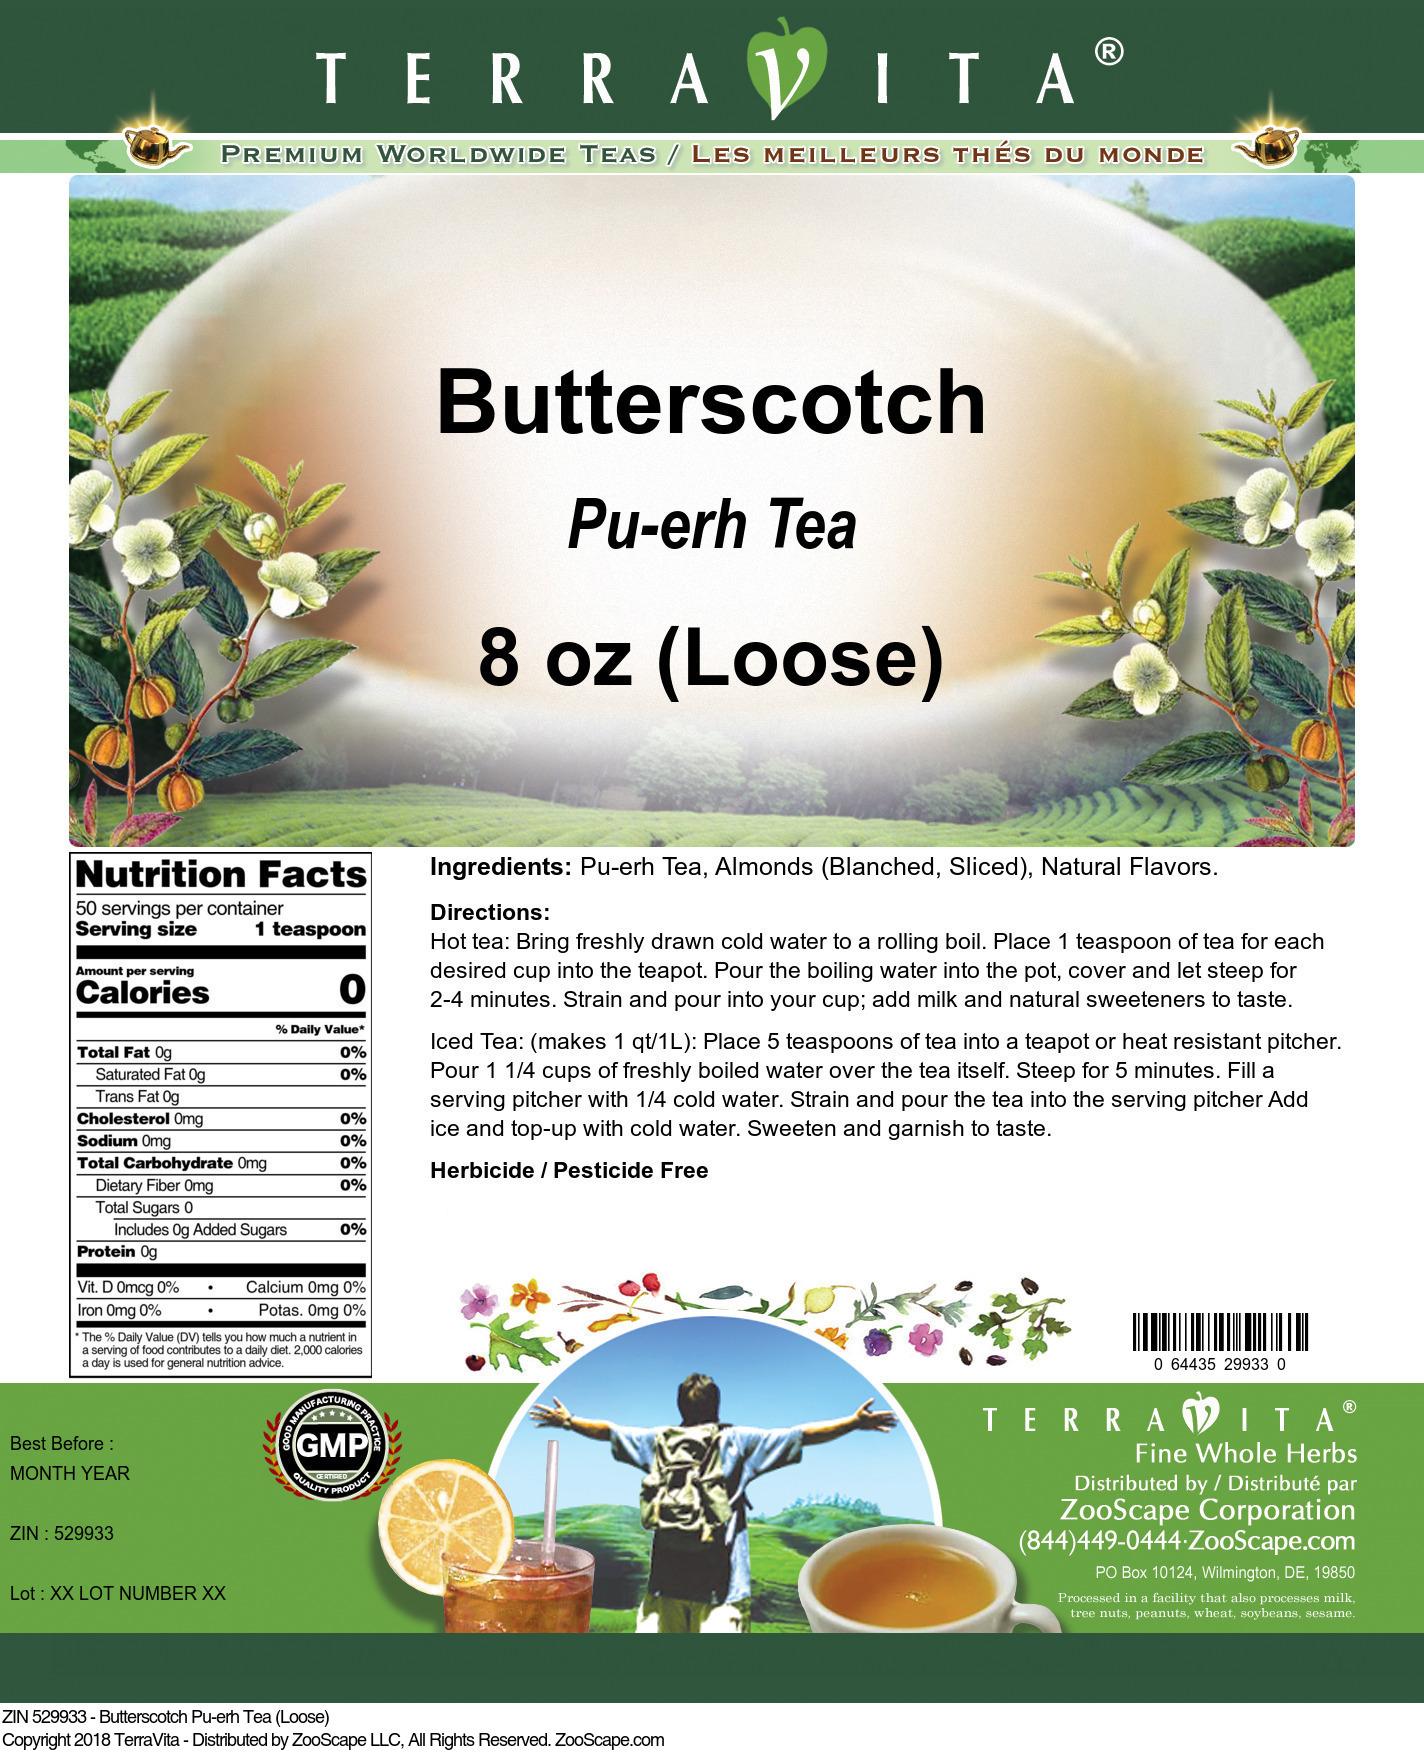 Butterscotch Pu-erh Tea (Loose)